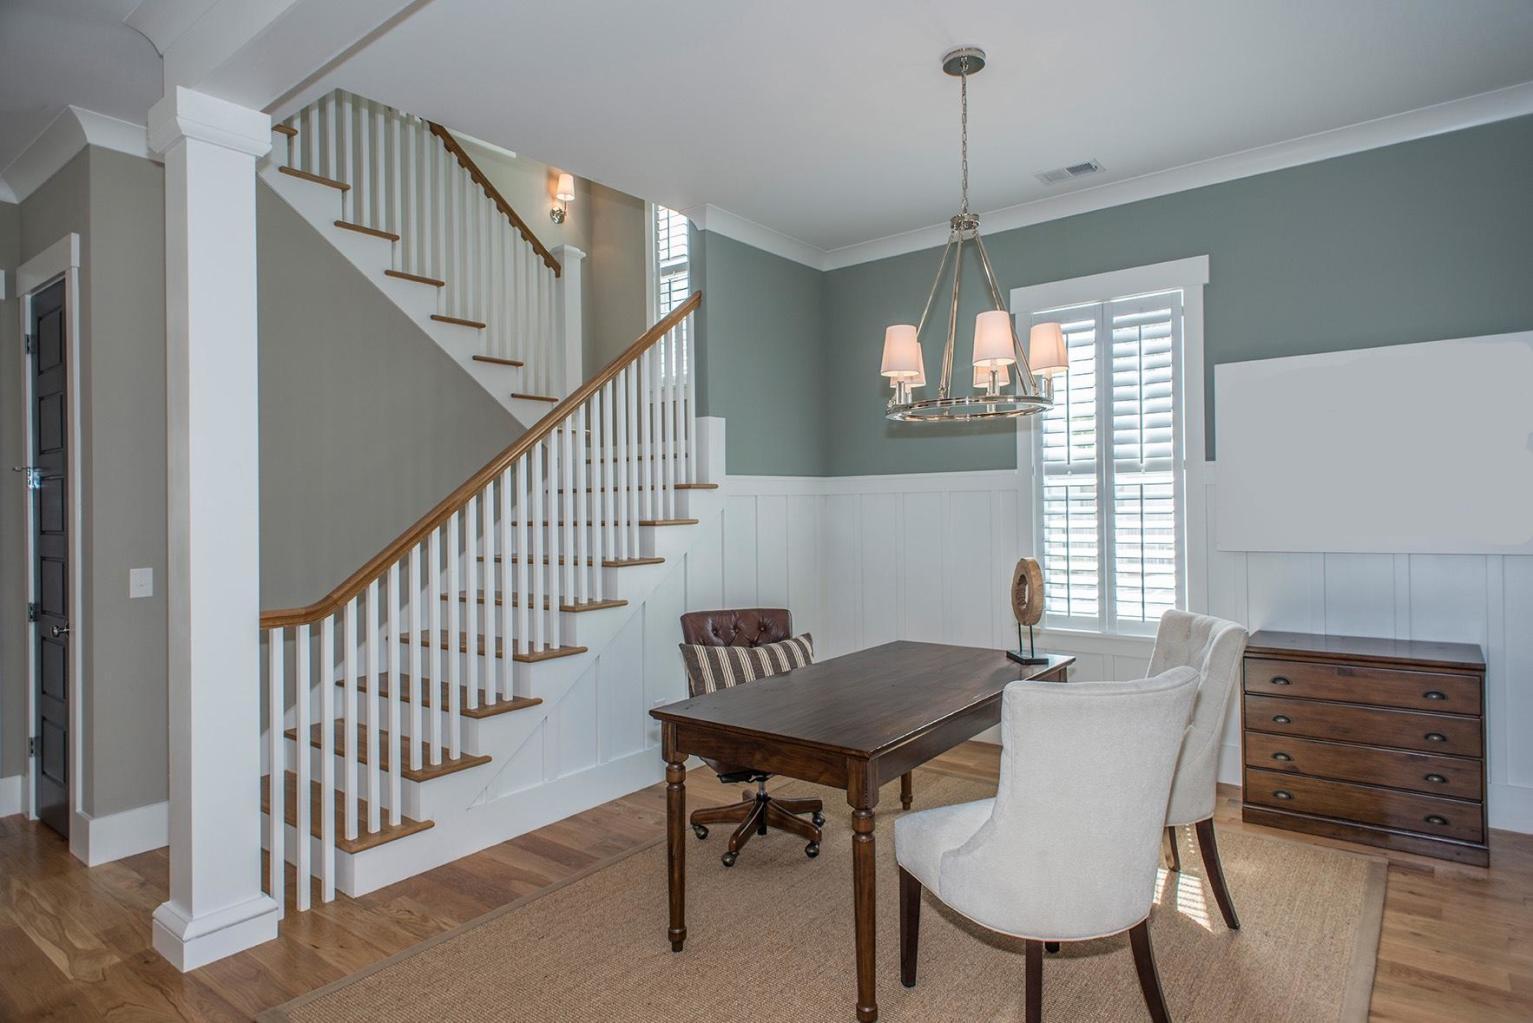 Carolina Park Homes For Sale - 1534 Banning, Mount Pleasant, SC - 19